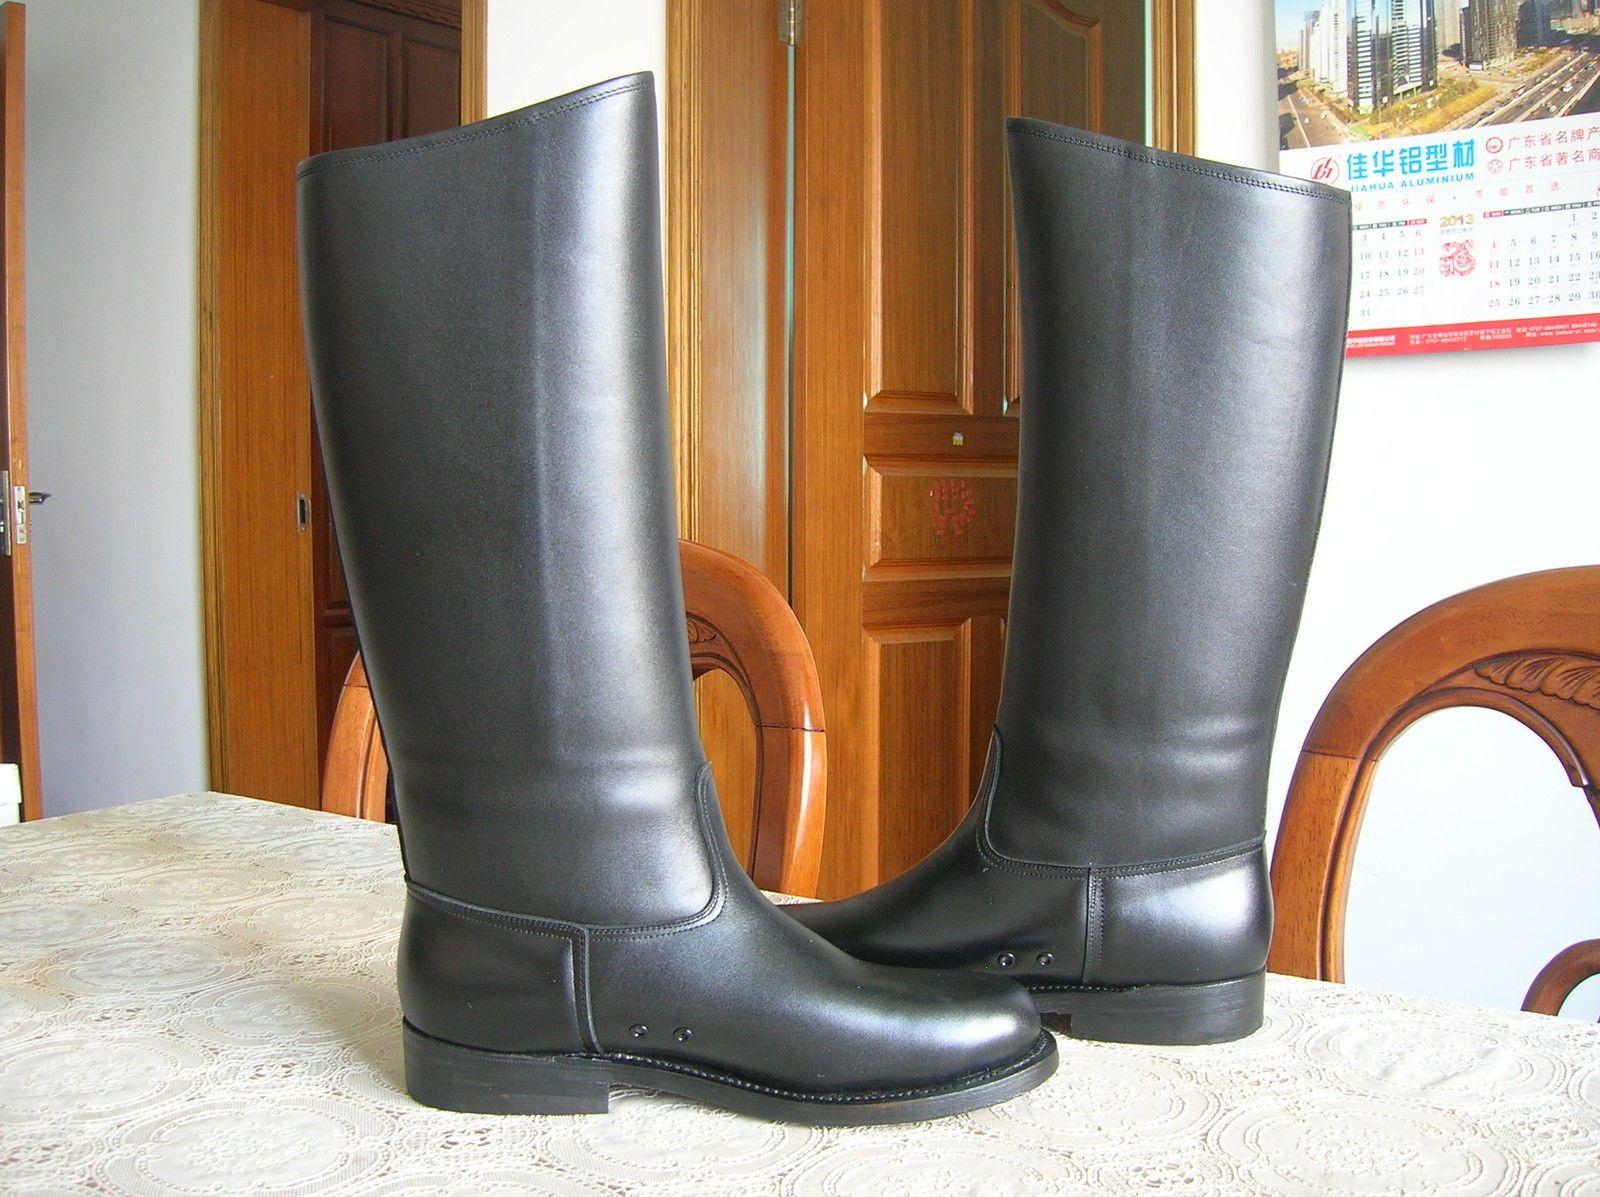 07 S Series China Pla Honor Guard Cattle Leather Boots Rare New Botas De Montar Espuelas Botas